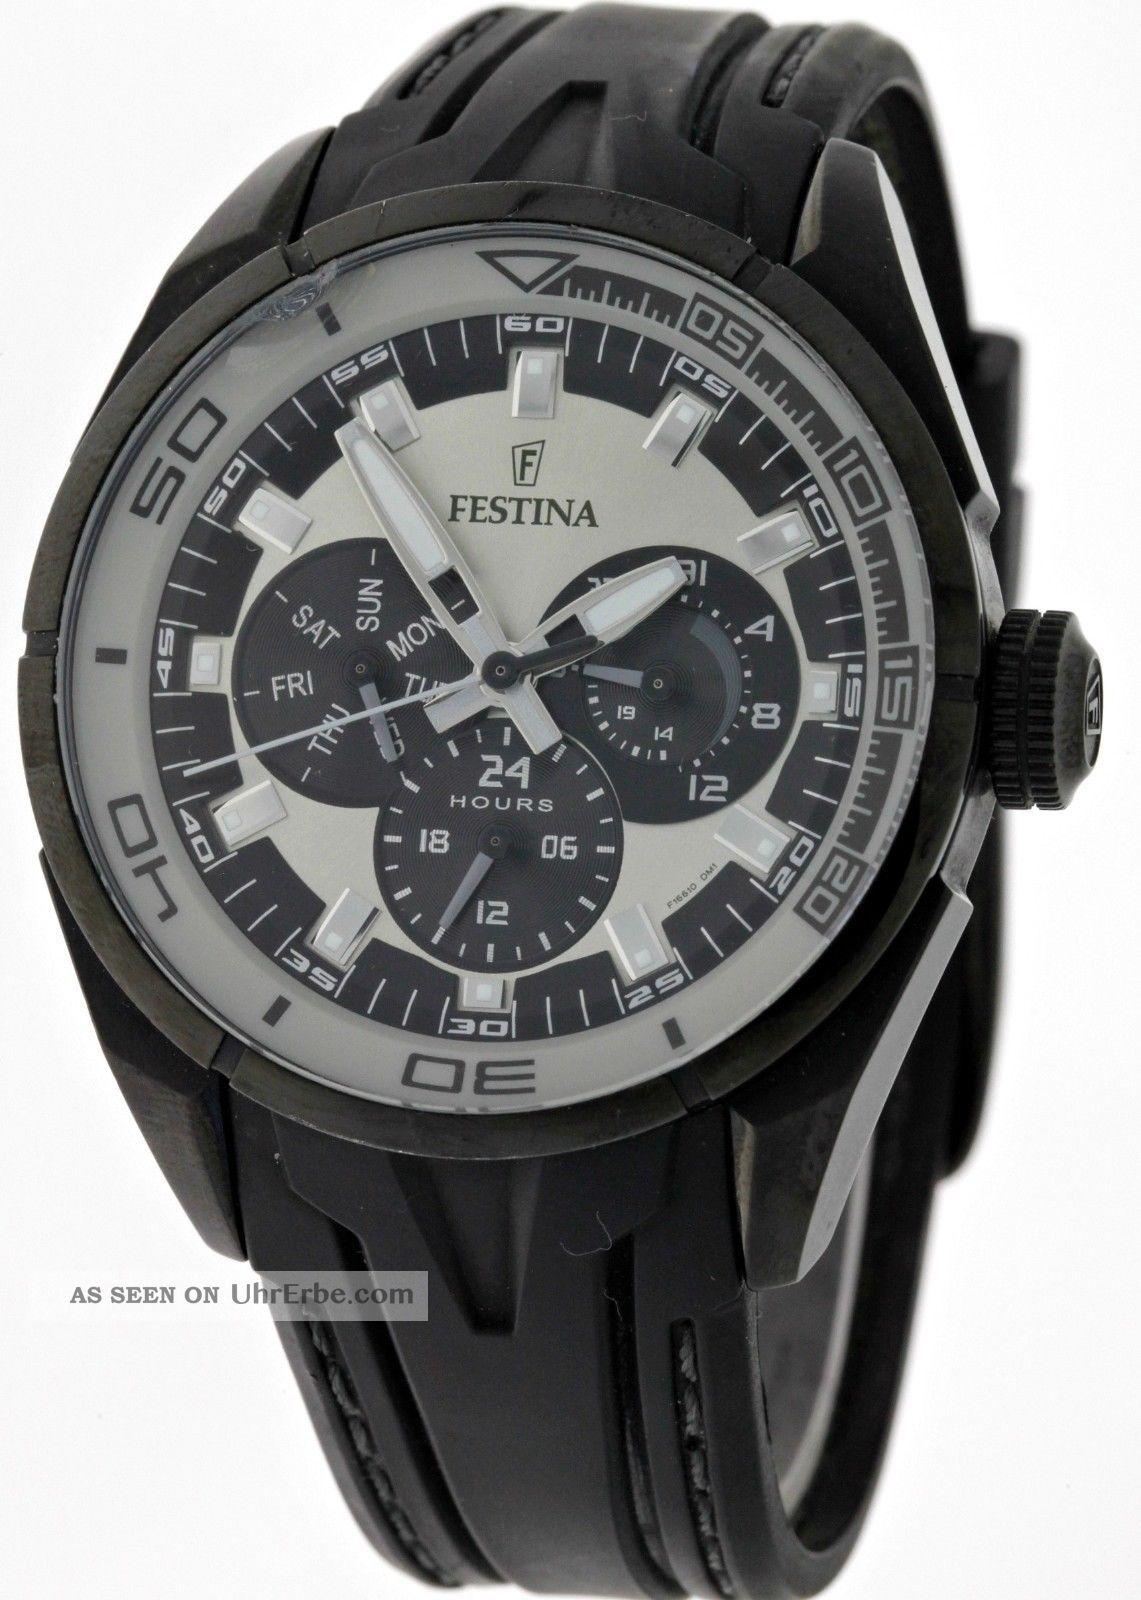 Festina F16610/1 Multifunktion Herren Sport Armbanduhr Edelstahl/kautschukband Armbanduhren Bild